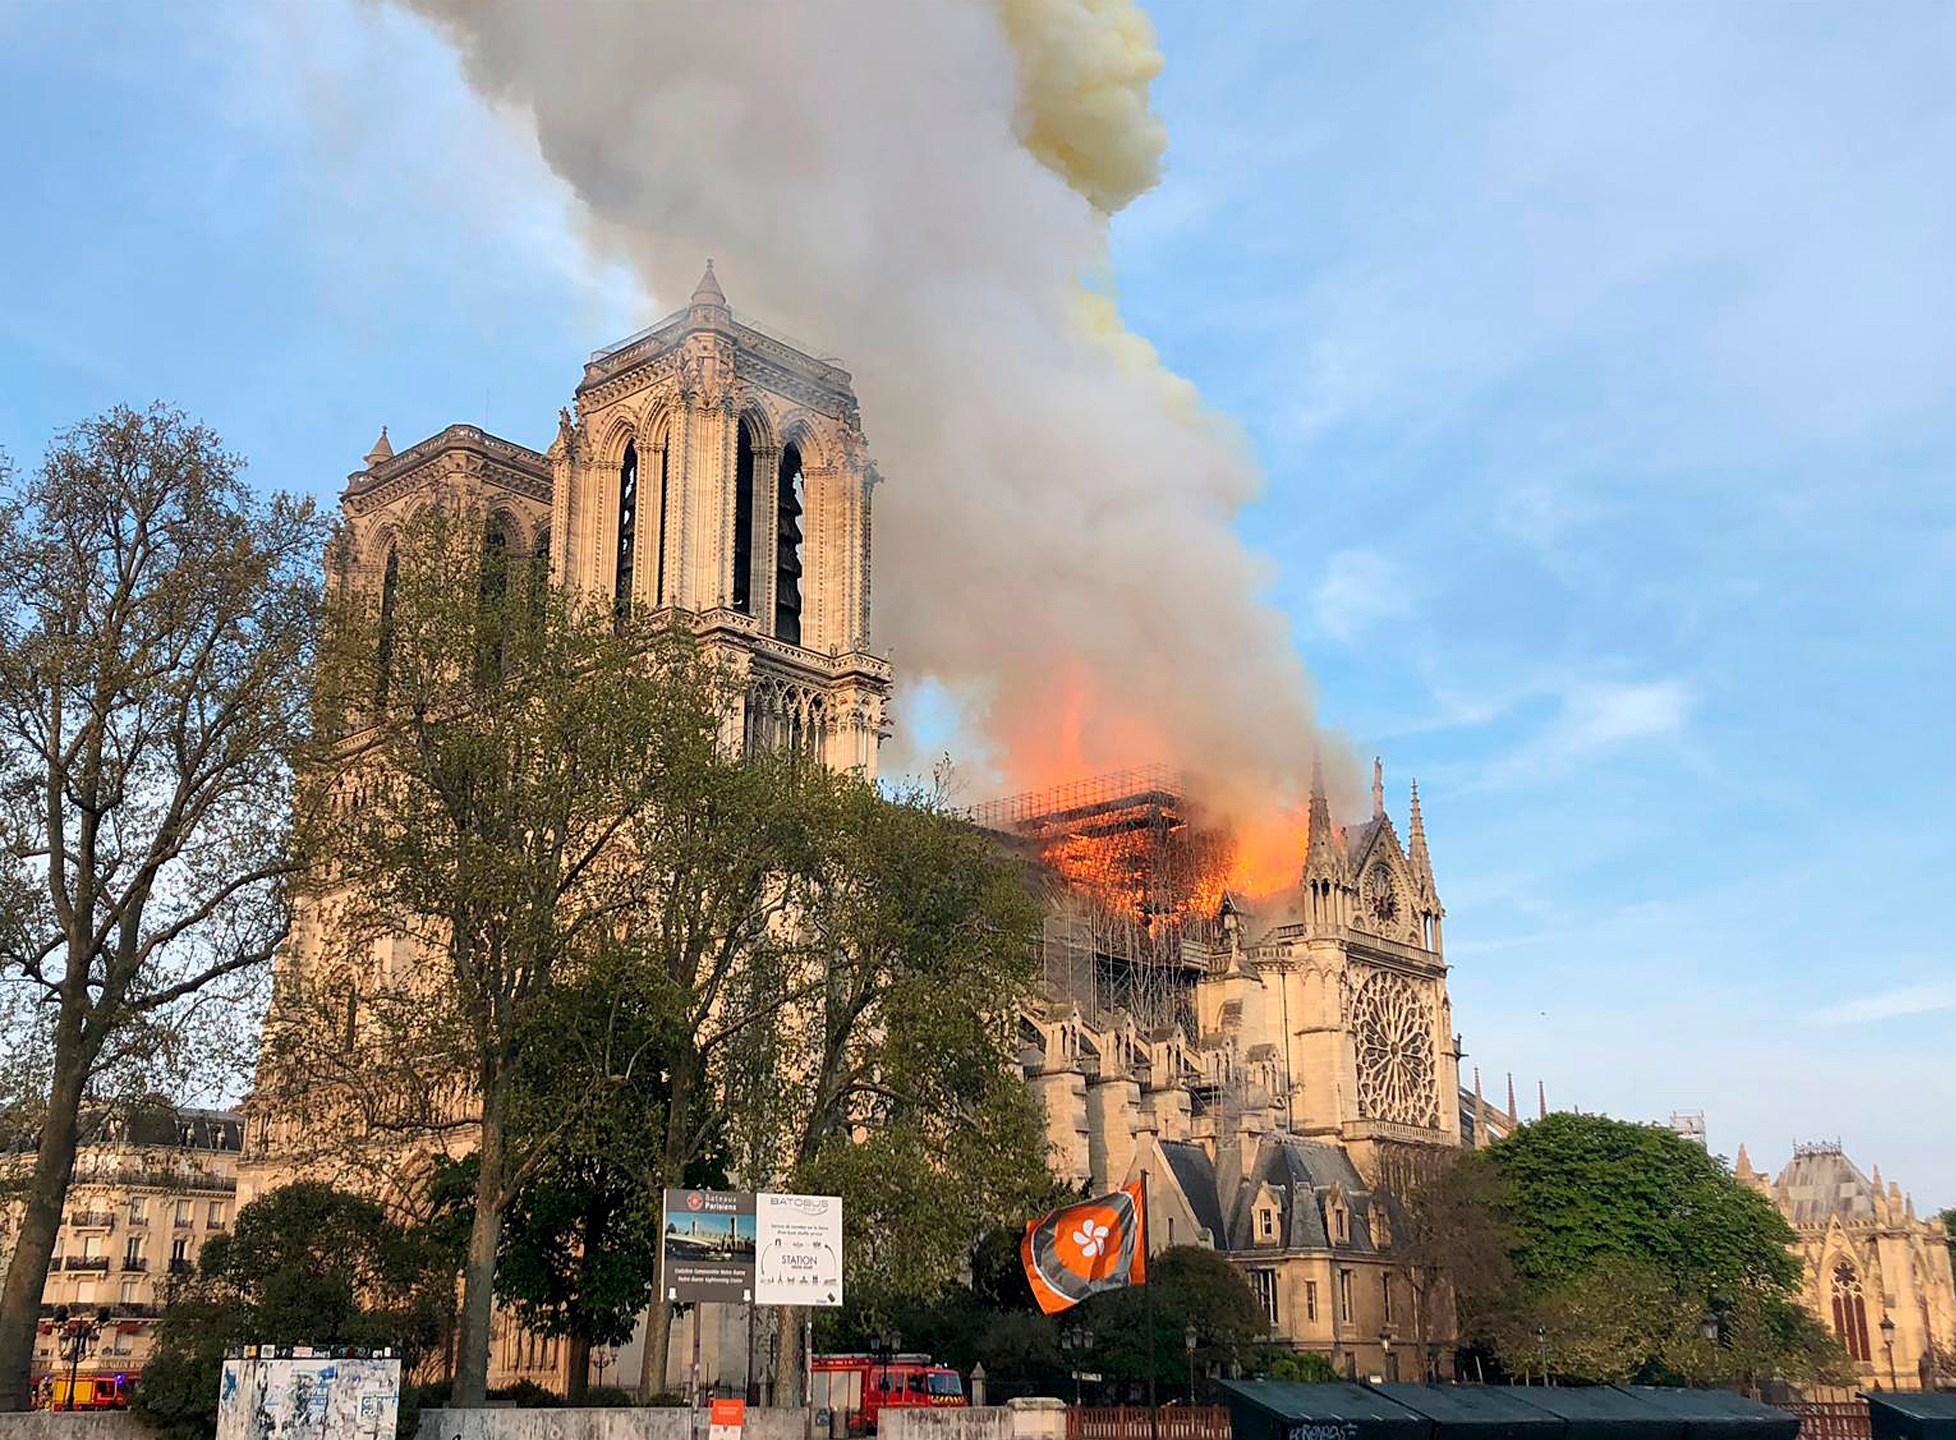 APTOPIX_France_Notre_Dame_Fire_23381-159532-159532.jpg99368112